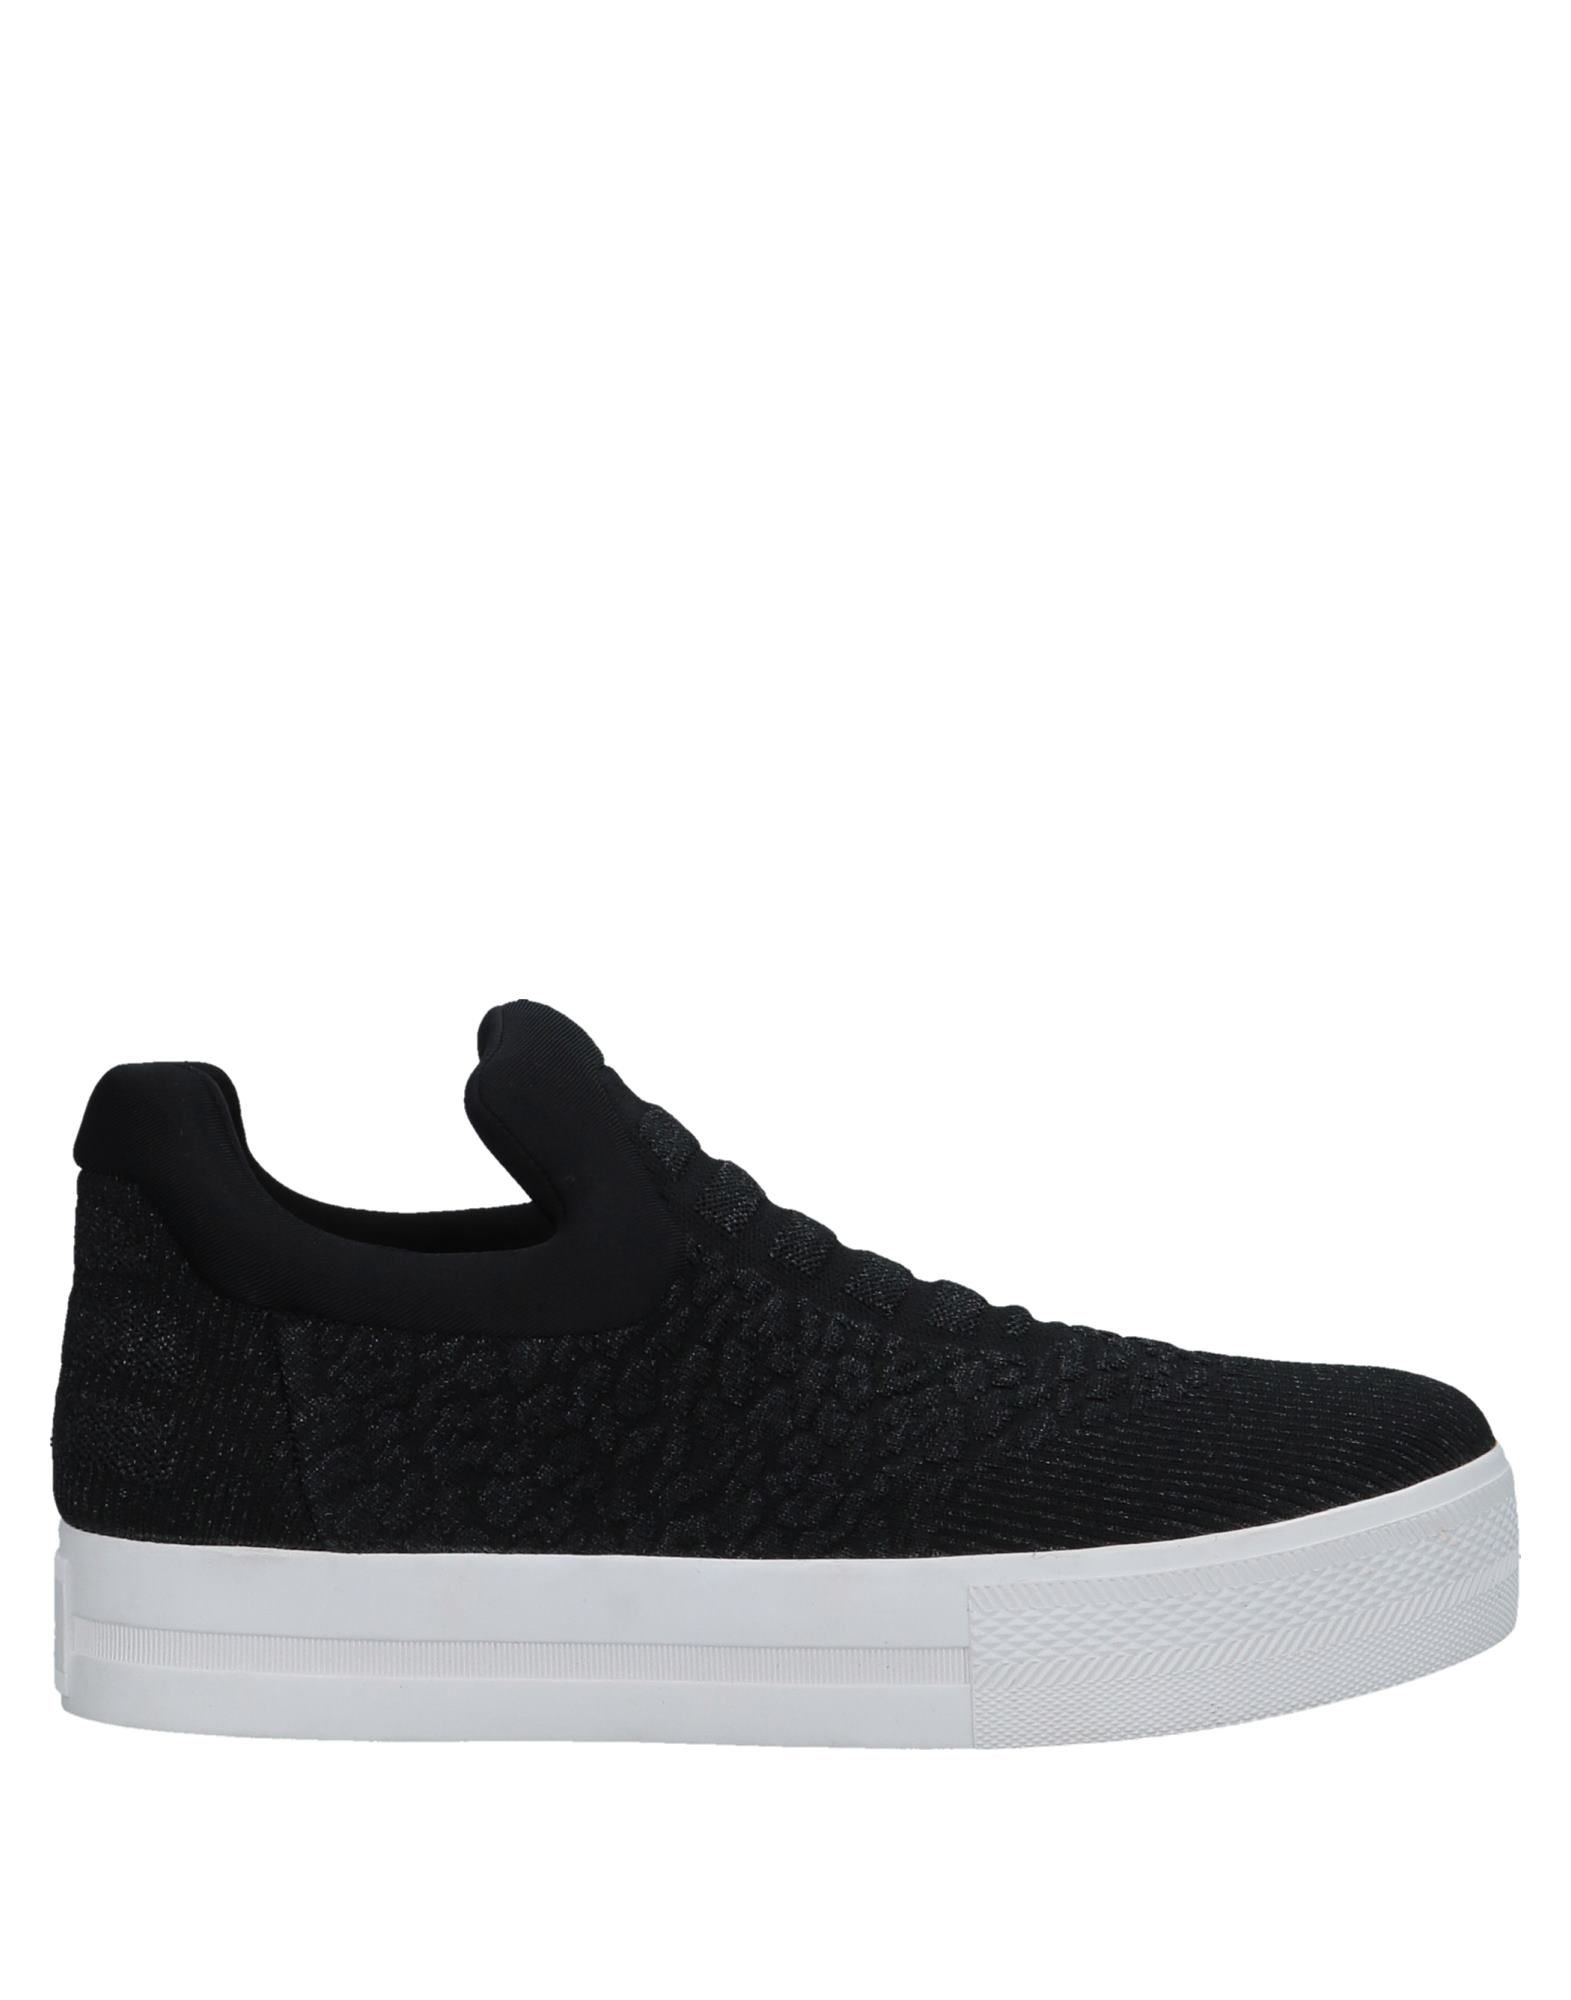 Gut um billige Damen Schuhe zu tragenAsh Sneakers Damen billige  11537625PB 9ca947